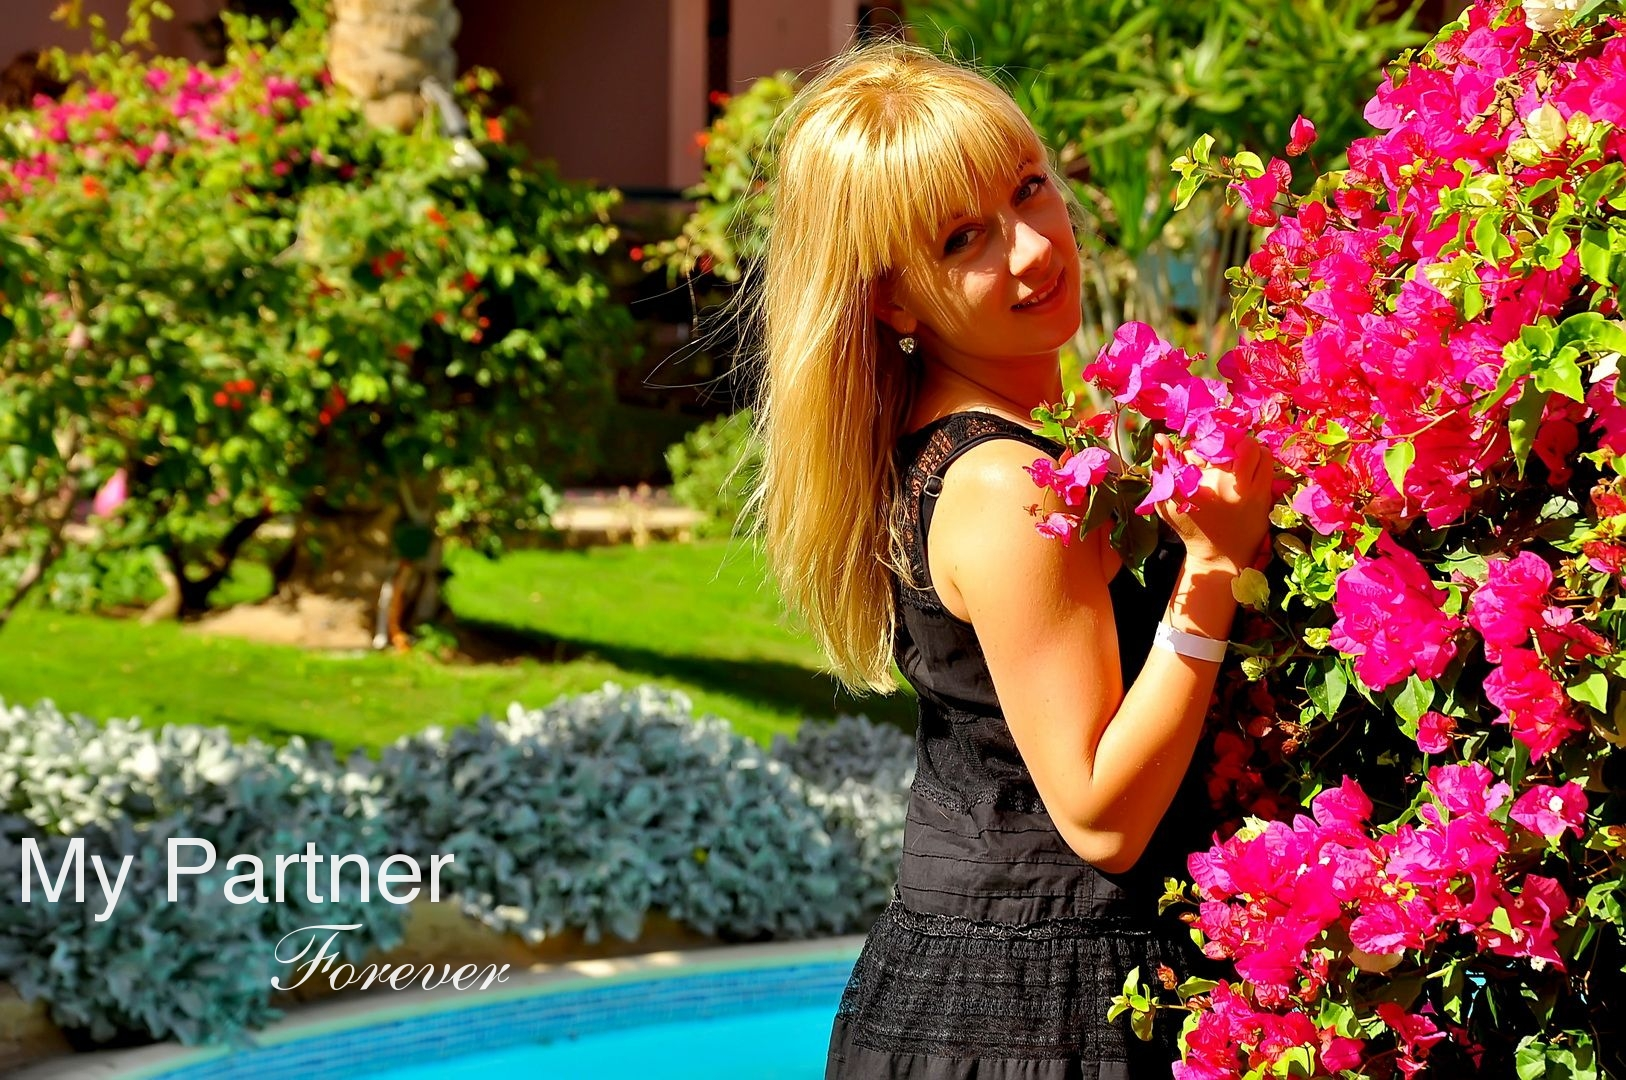 Dating Site to Meet Charming Ukrainian Girl Marina from Kharkov, Ukraine